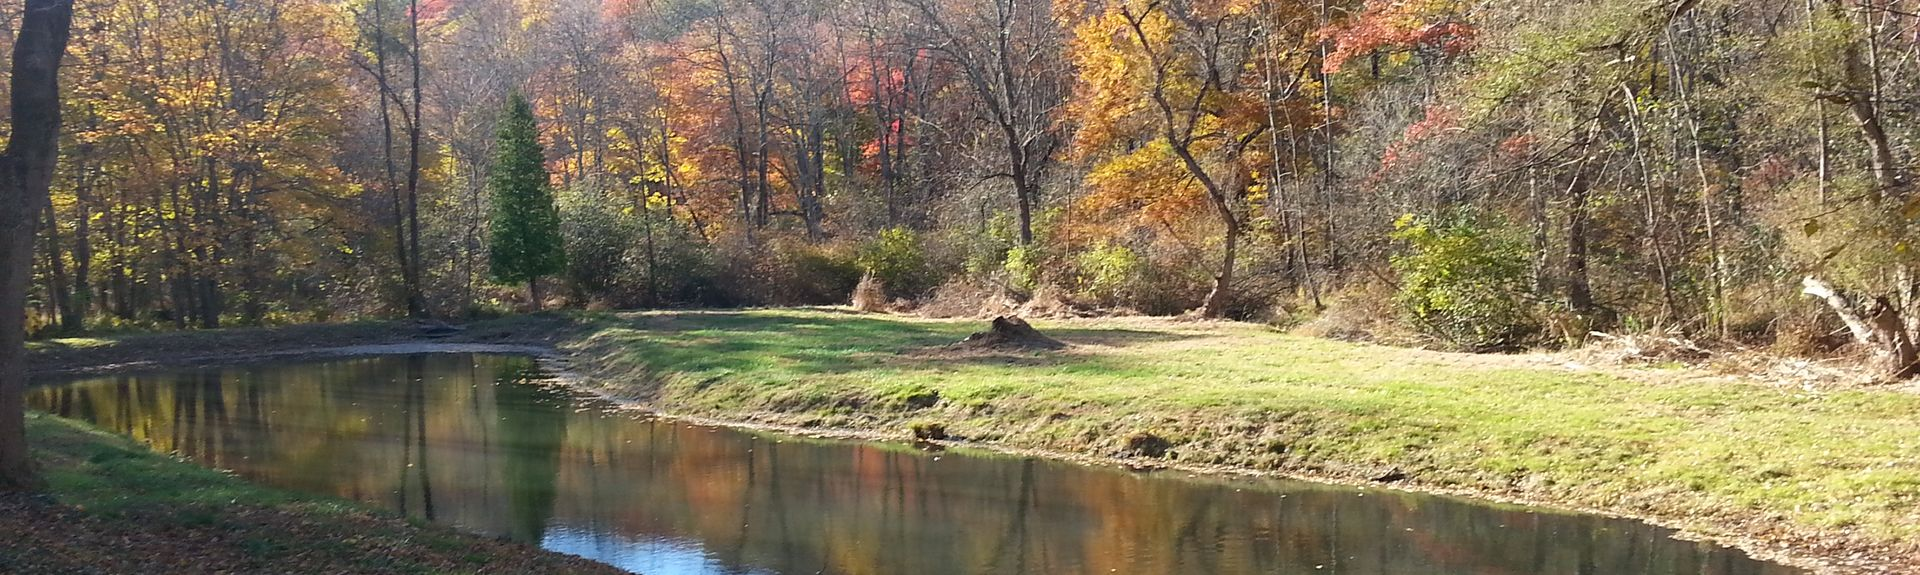 Woodcliff Lake, NJ, USA